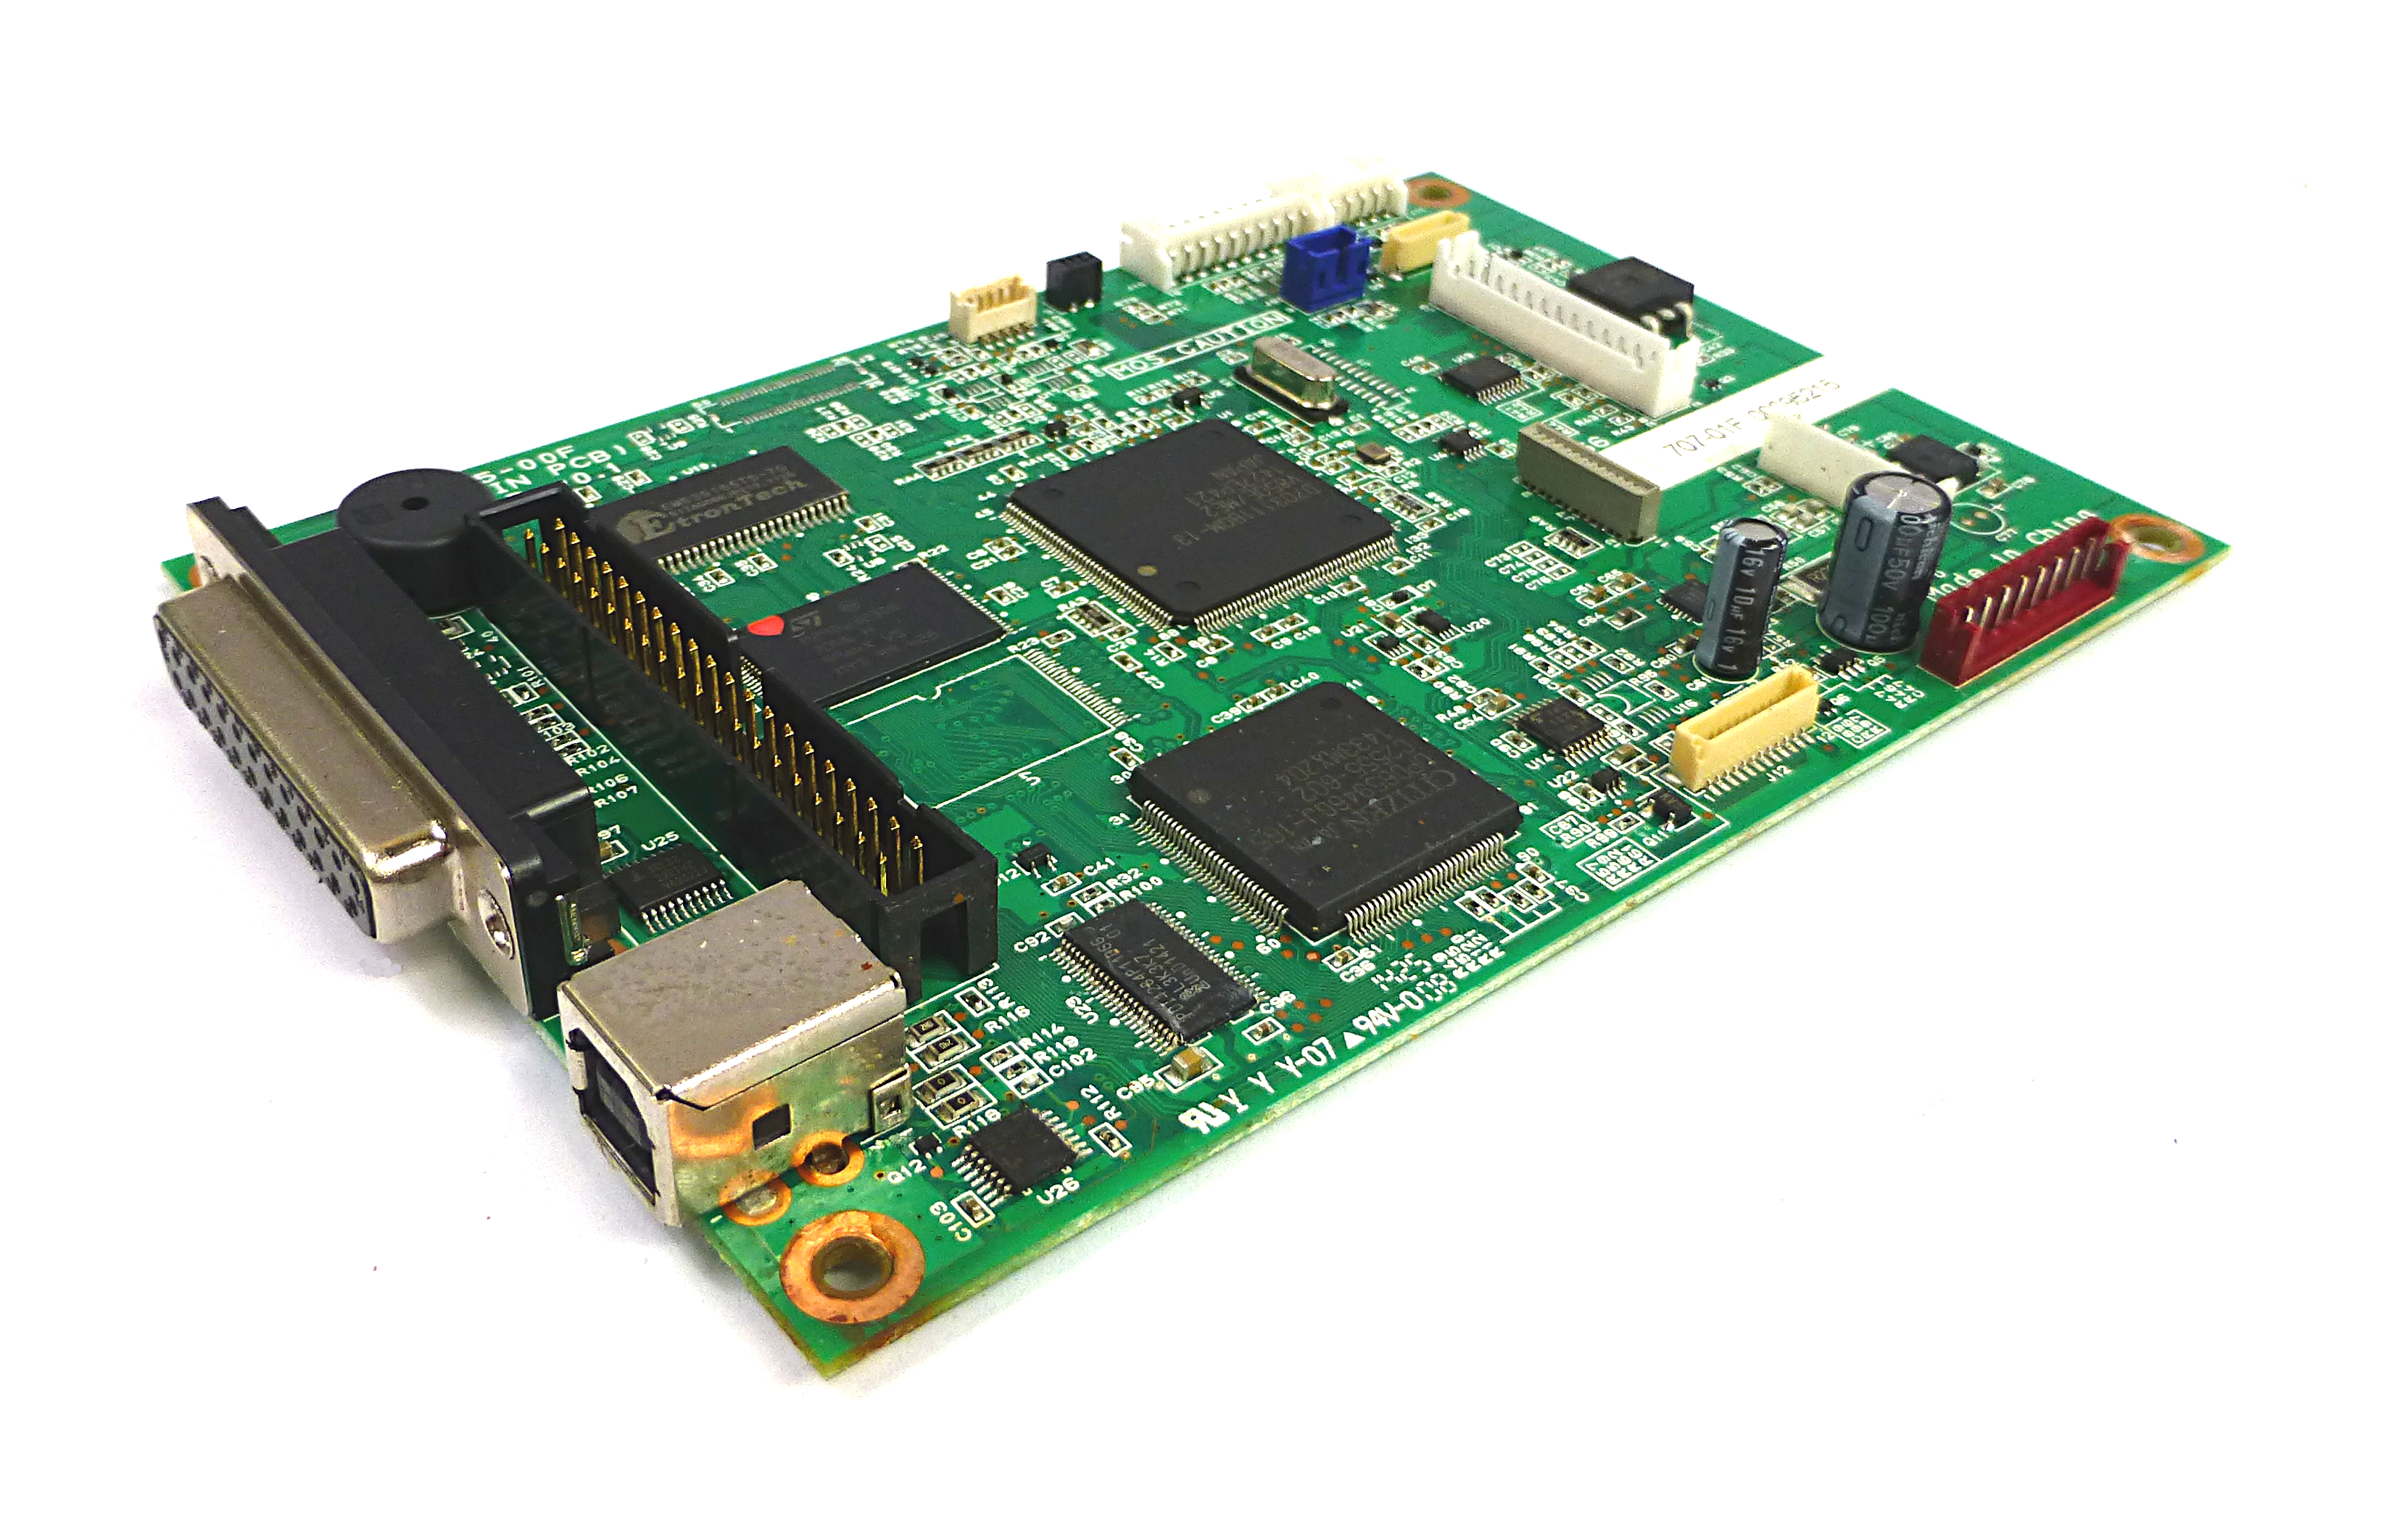 Citizen JM66905-00F Main Board for CL-S521 Thermal Label Printer